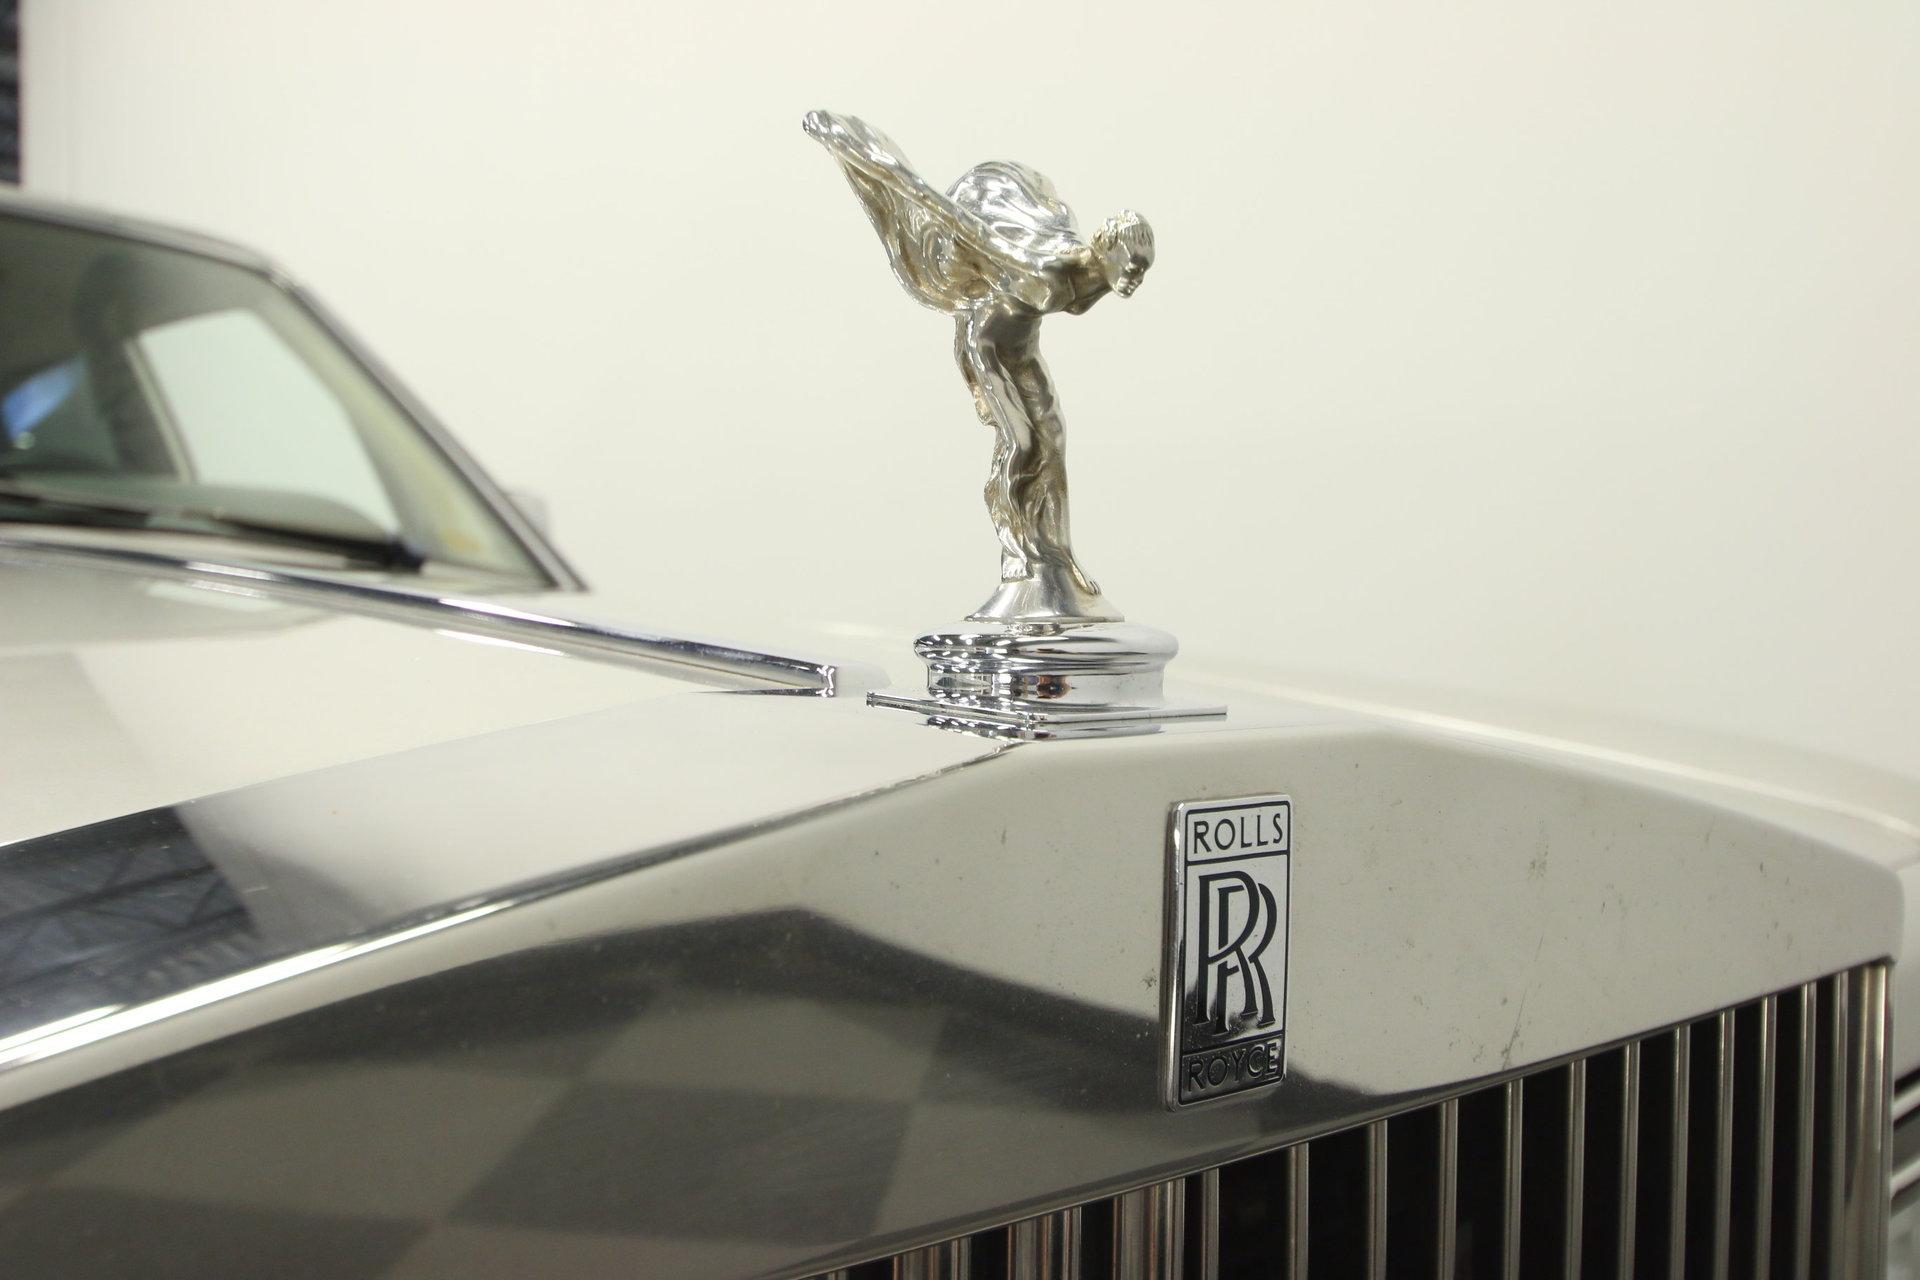 1990 Rolls Royce Silver Spur Ii Streetside Classics The Nations